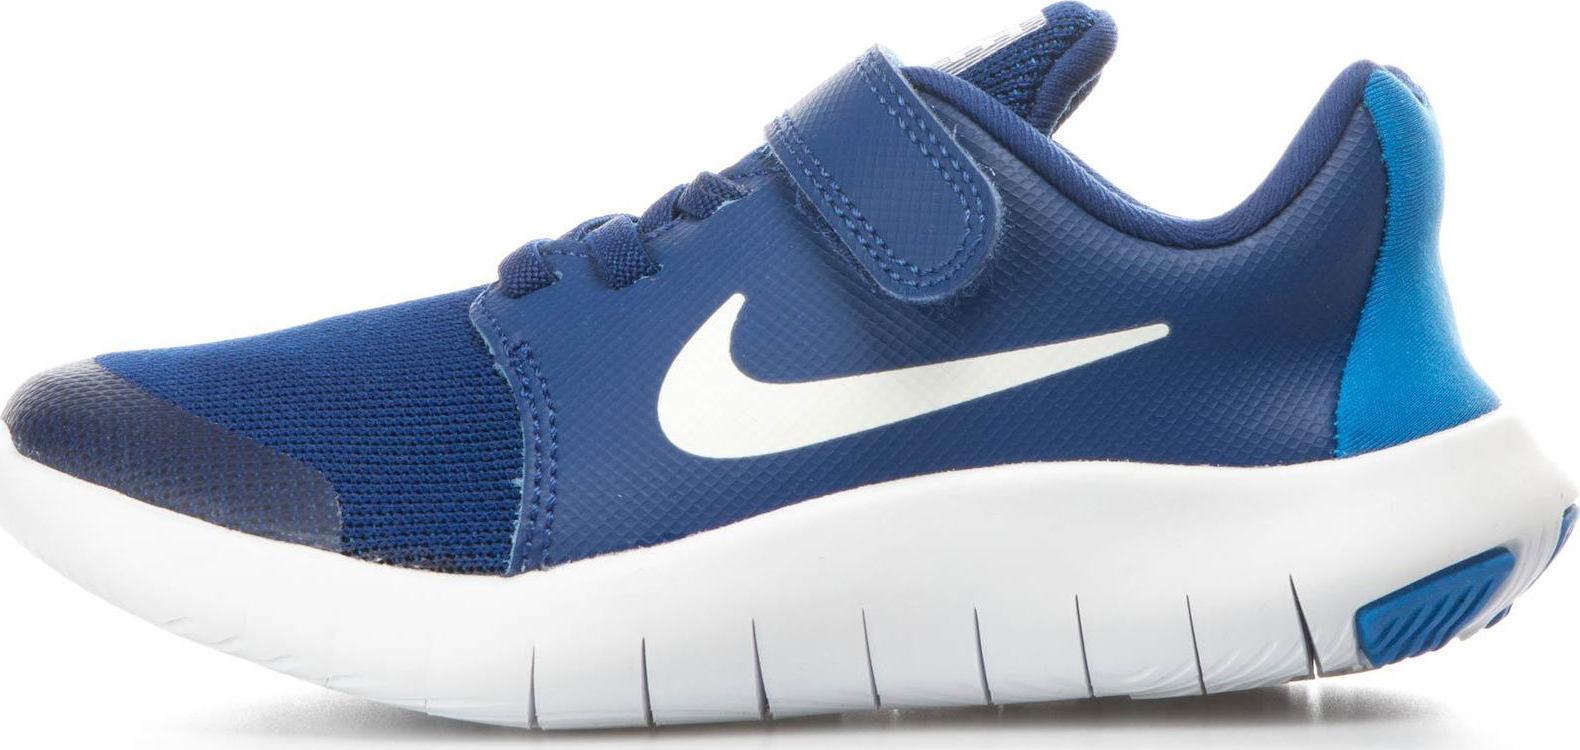 sports shoes 89733 e2093 Προσθήκη στα αγαπημένα menu Nike Flex Contact 2 GS AH3444-401